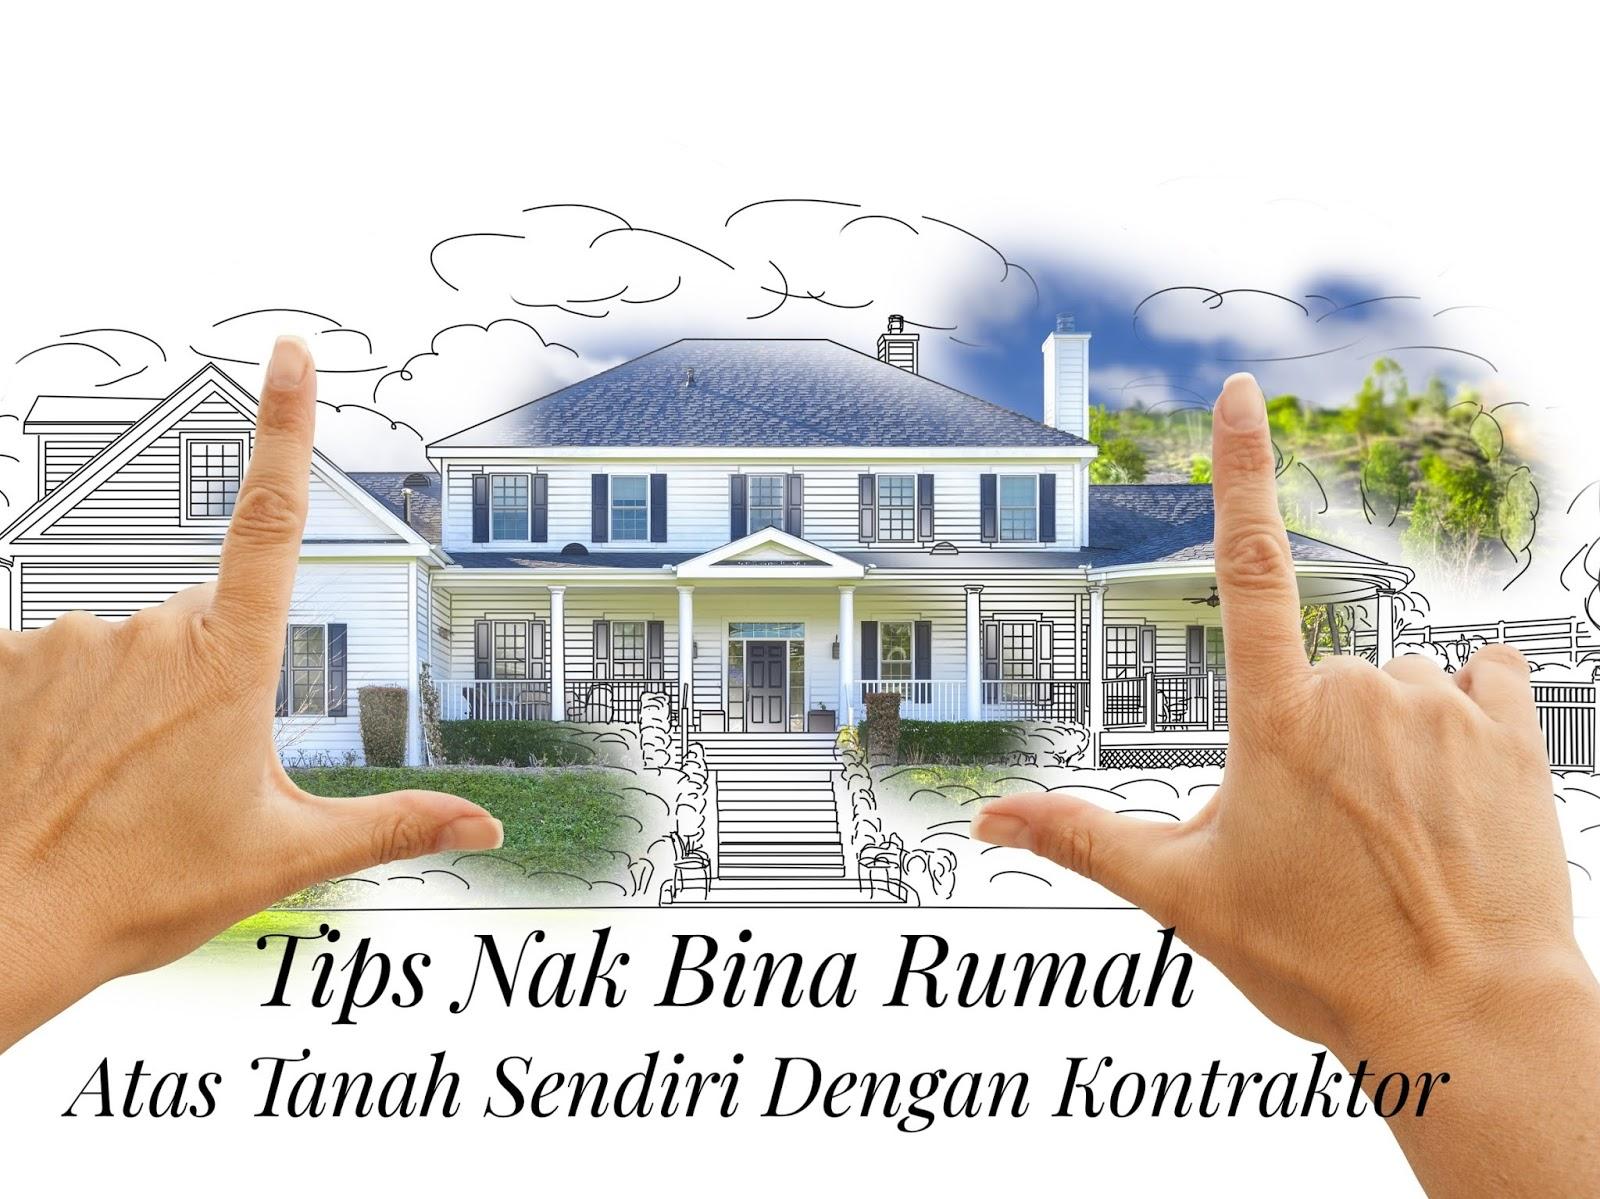 Tips Nak Bina Rumah Atas Tanah Sendiri Dengan Kontraktor Ana Suhana